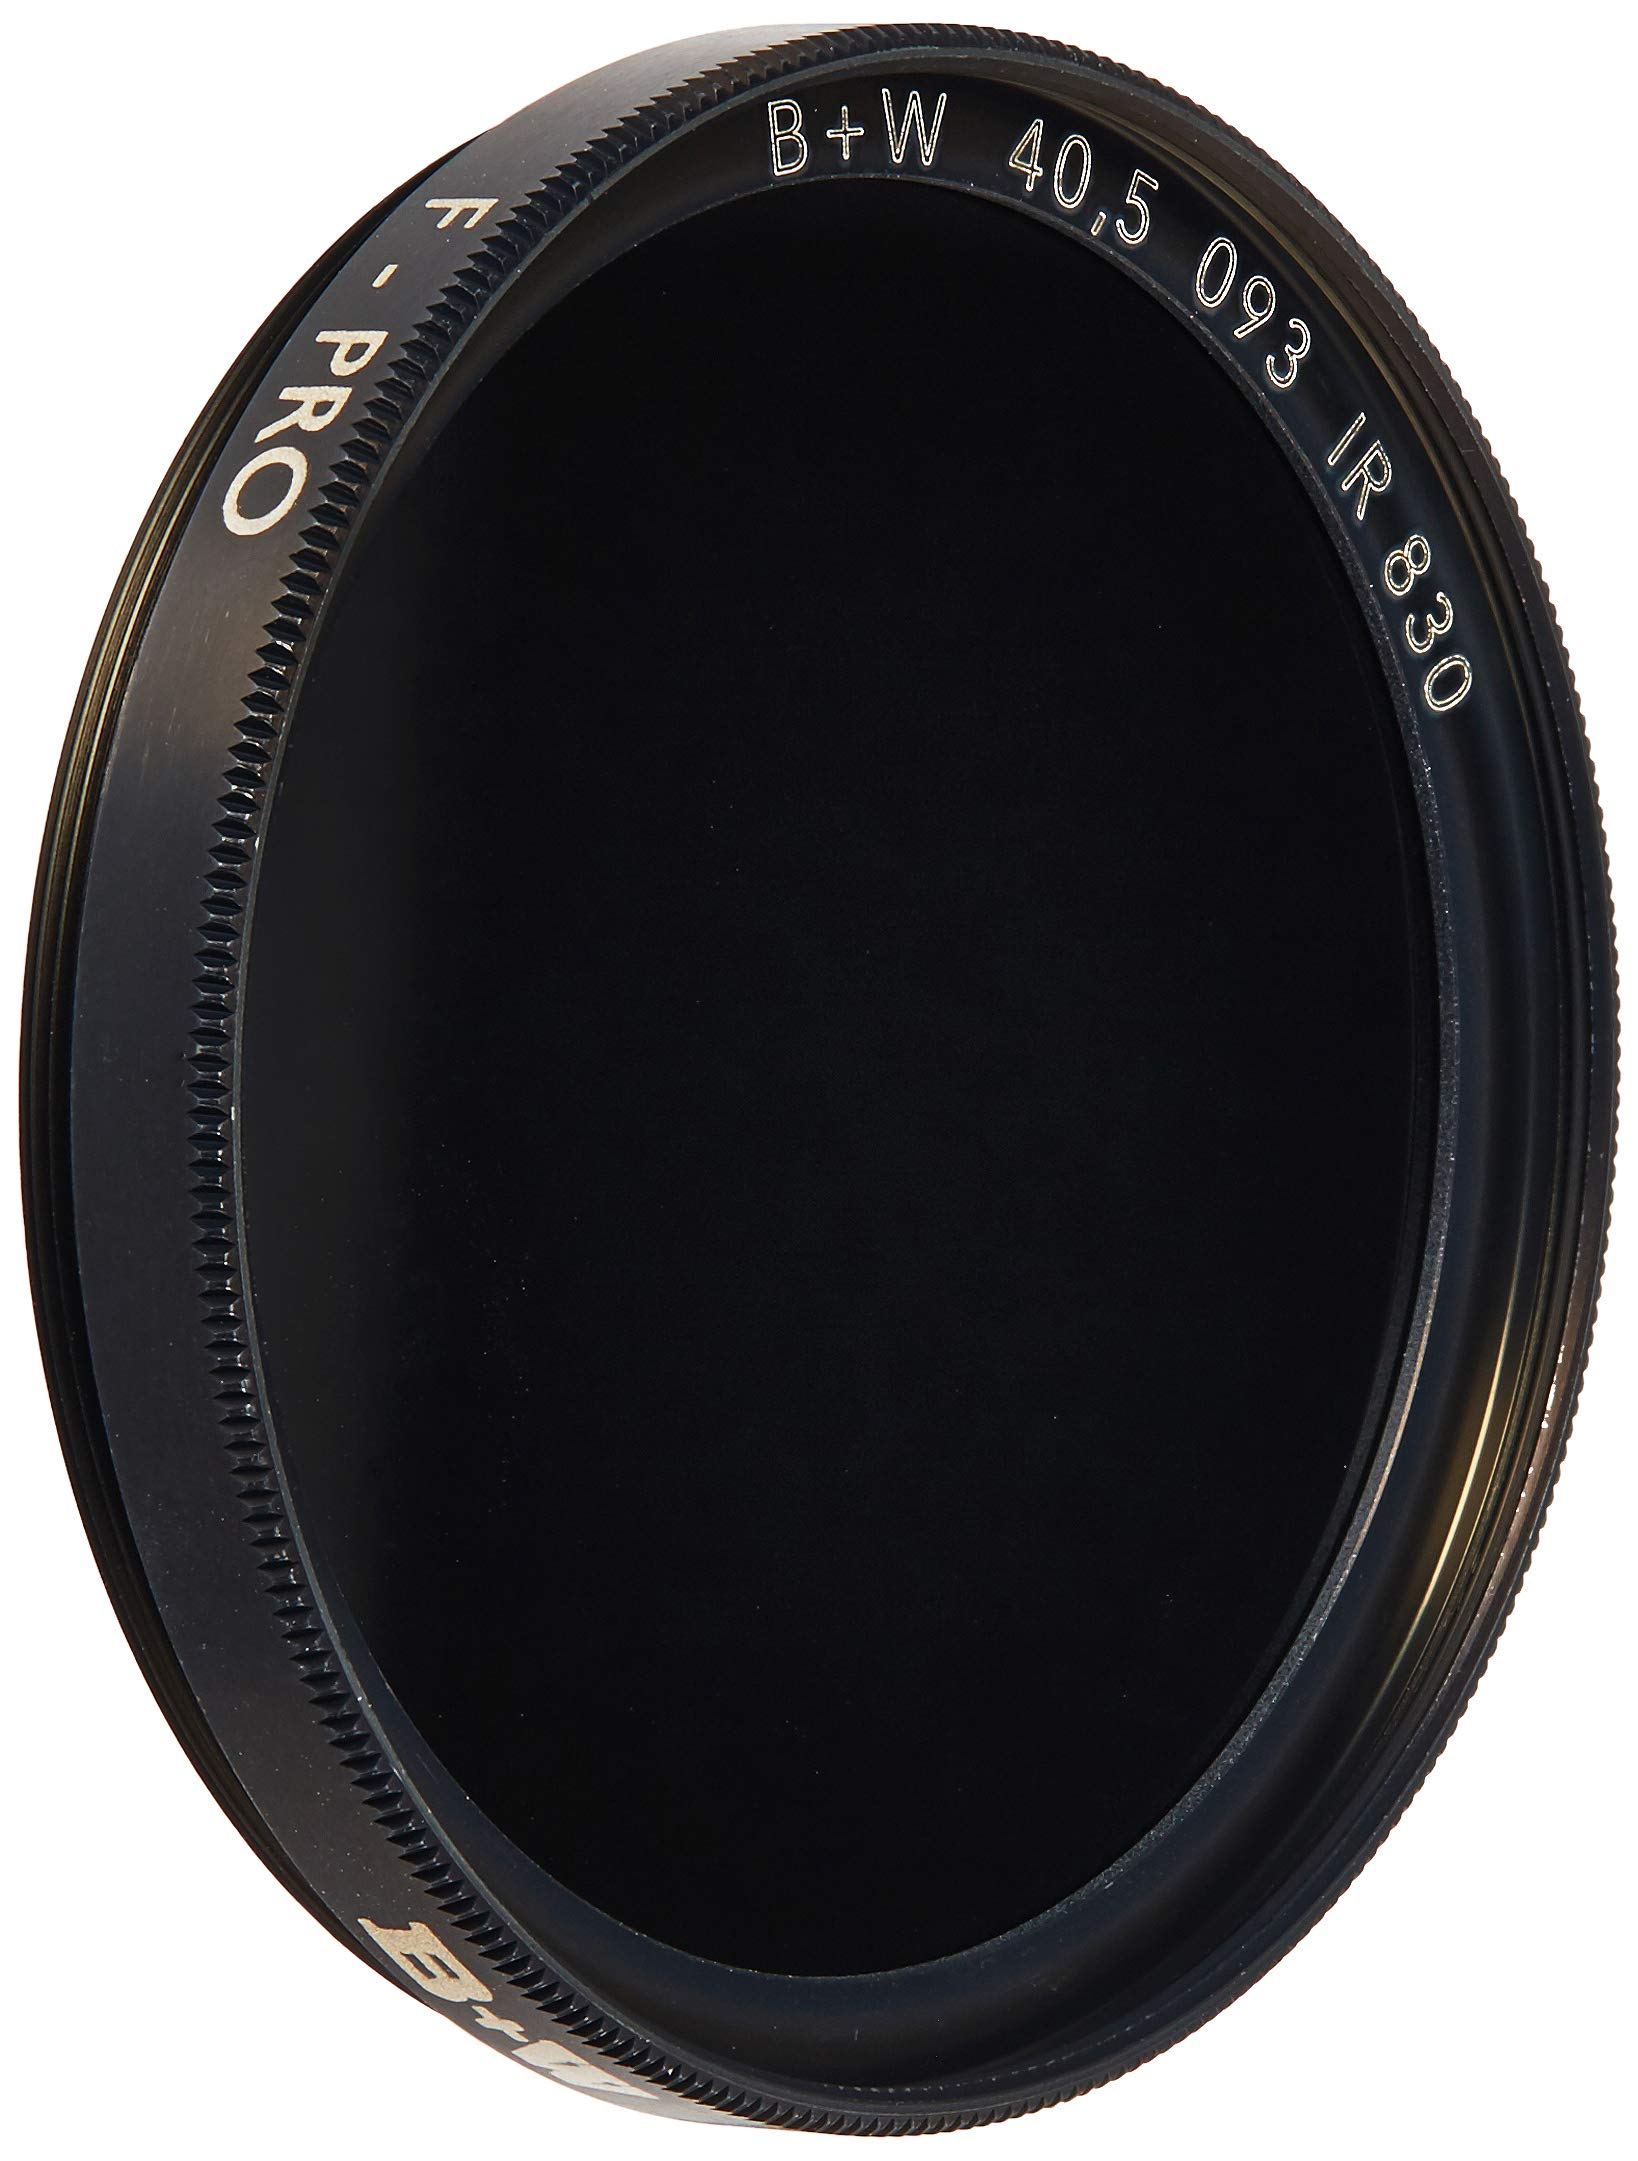 B+W 40.5mm Infrared Pass Camera Lens Filter, Black 093